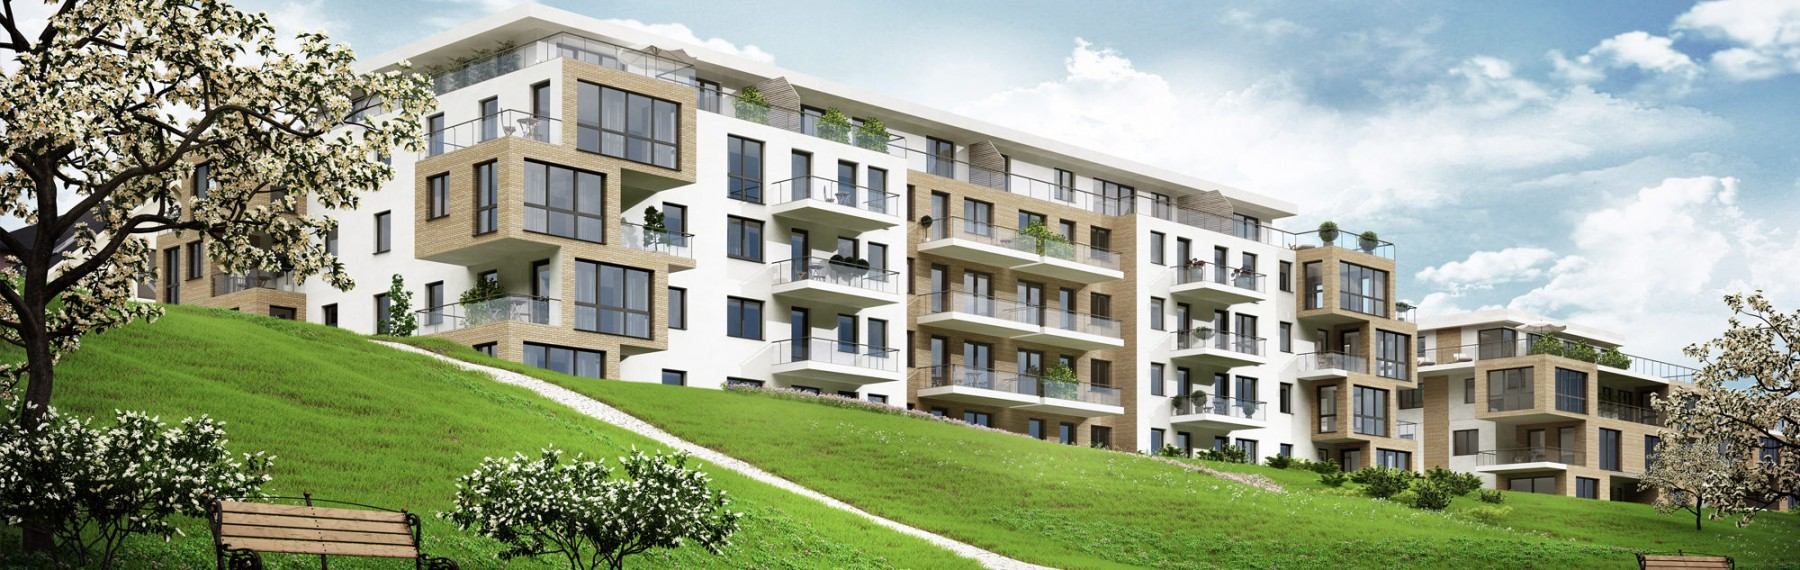 Wohnpark Sundblick - Apartmenthaus Rügen